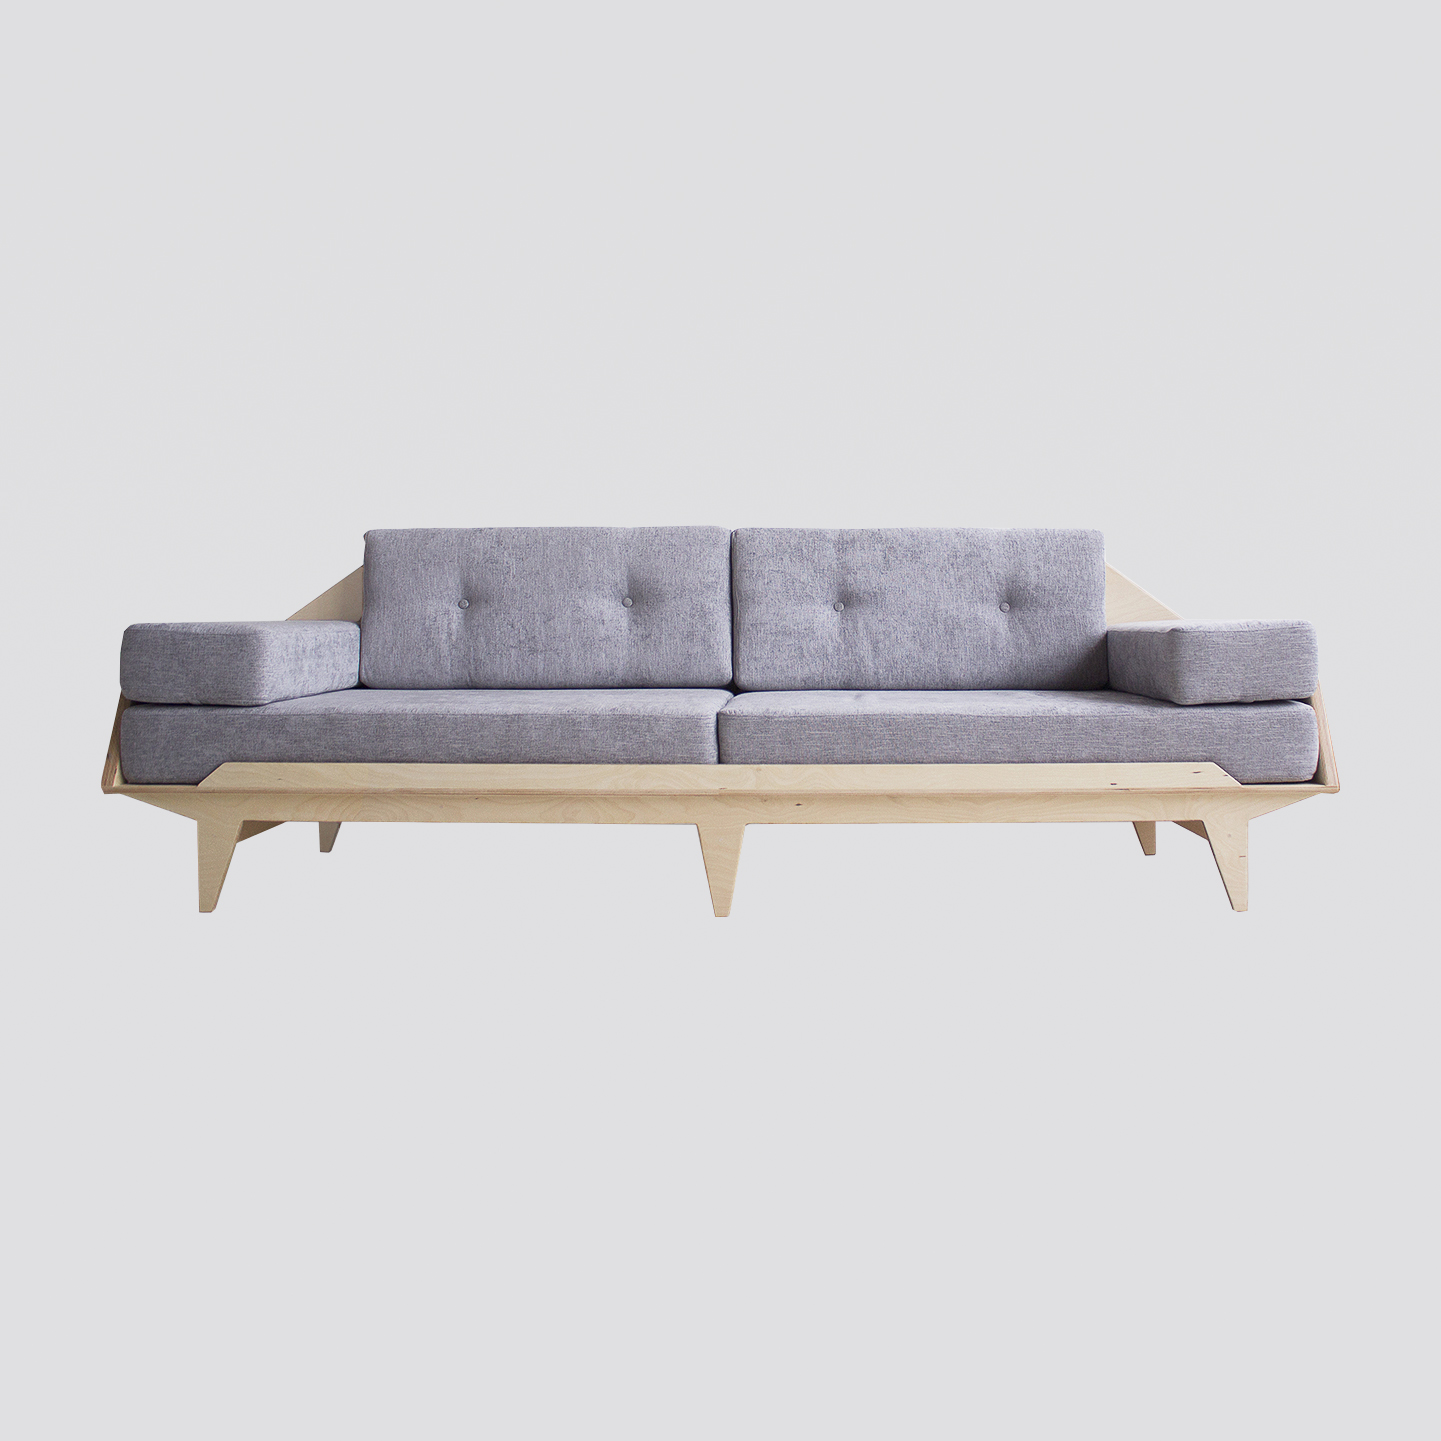 Zdjęcie produktu NORSK.maxi - sofa